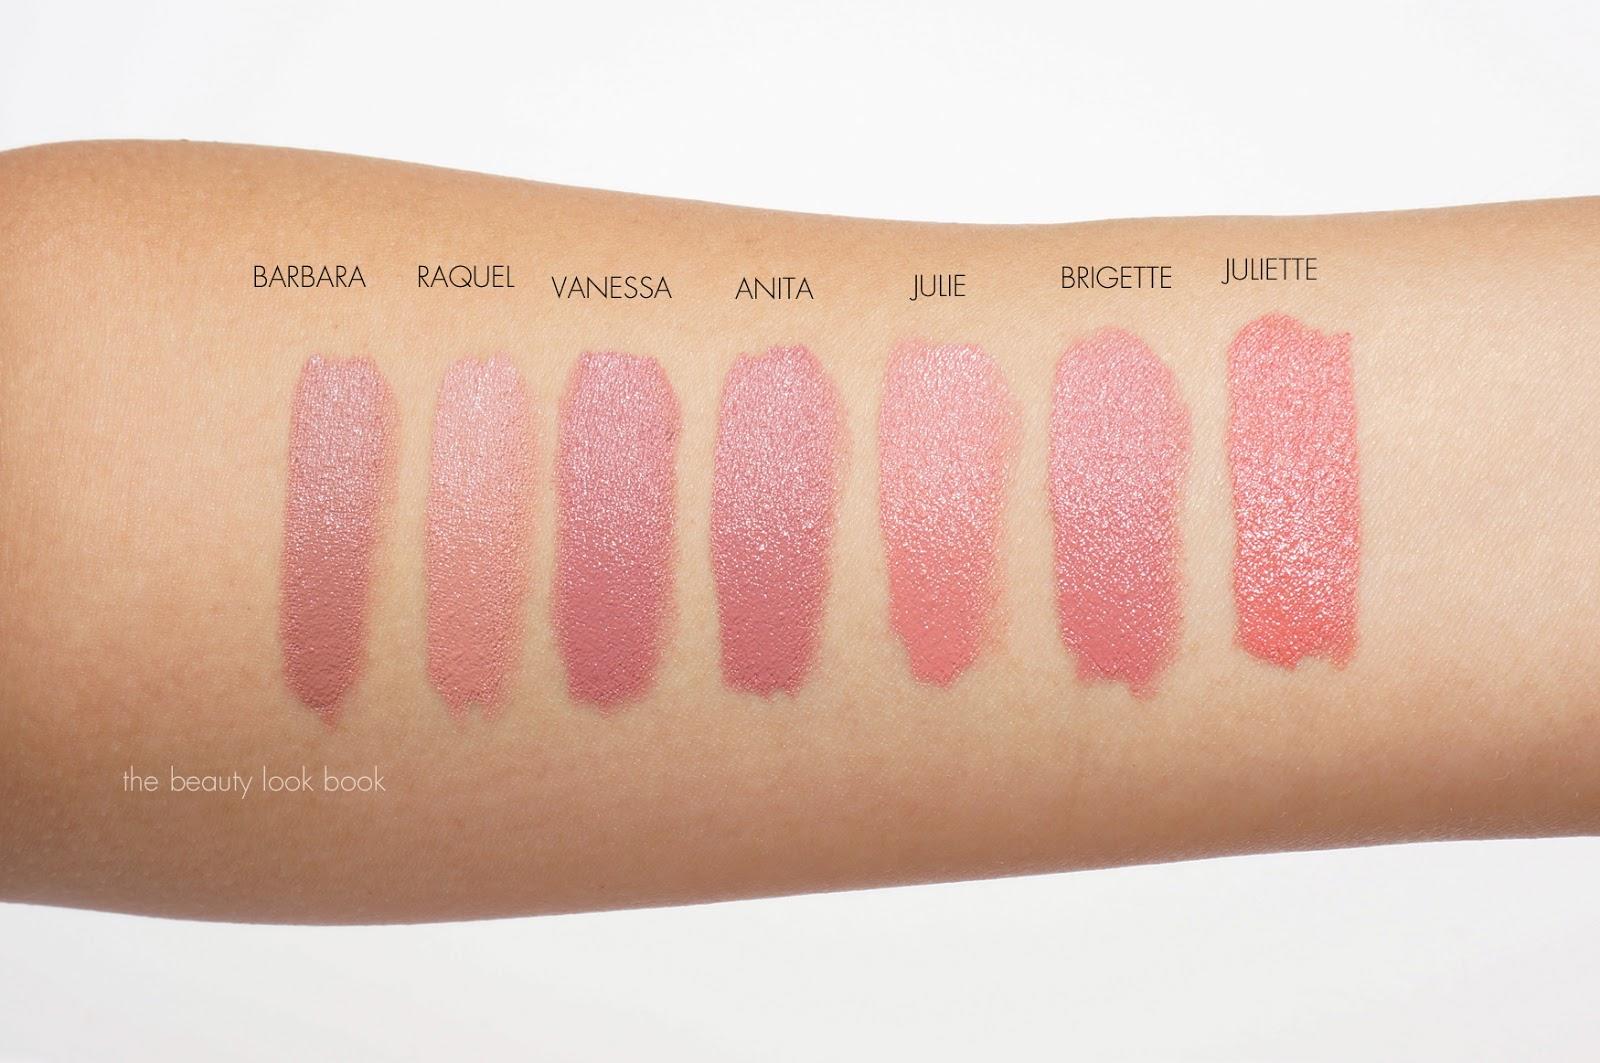 Lipstick by NARS #10